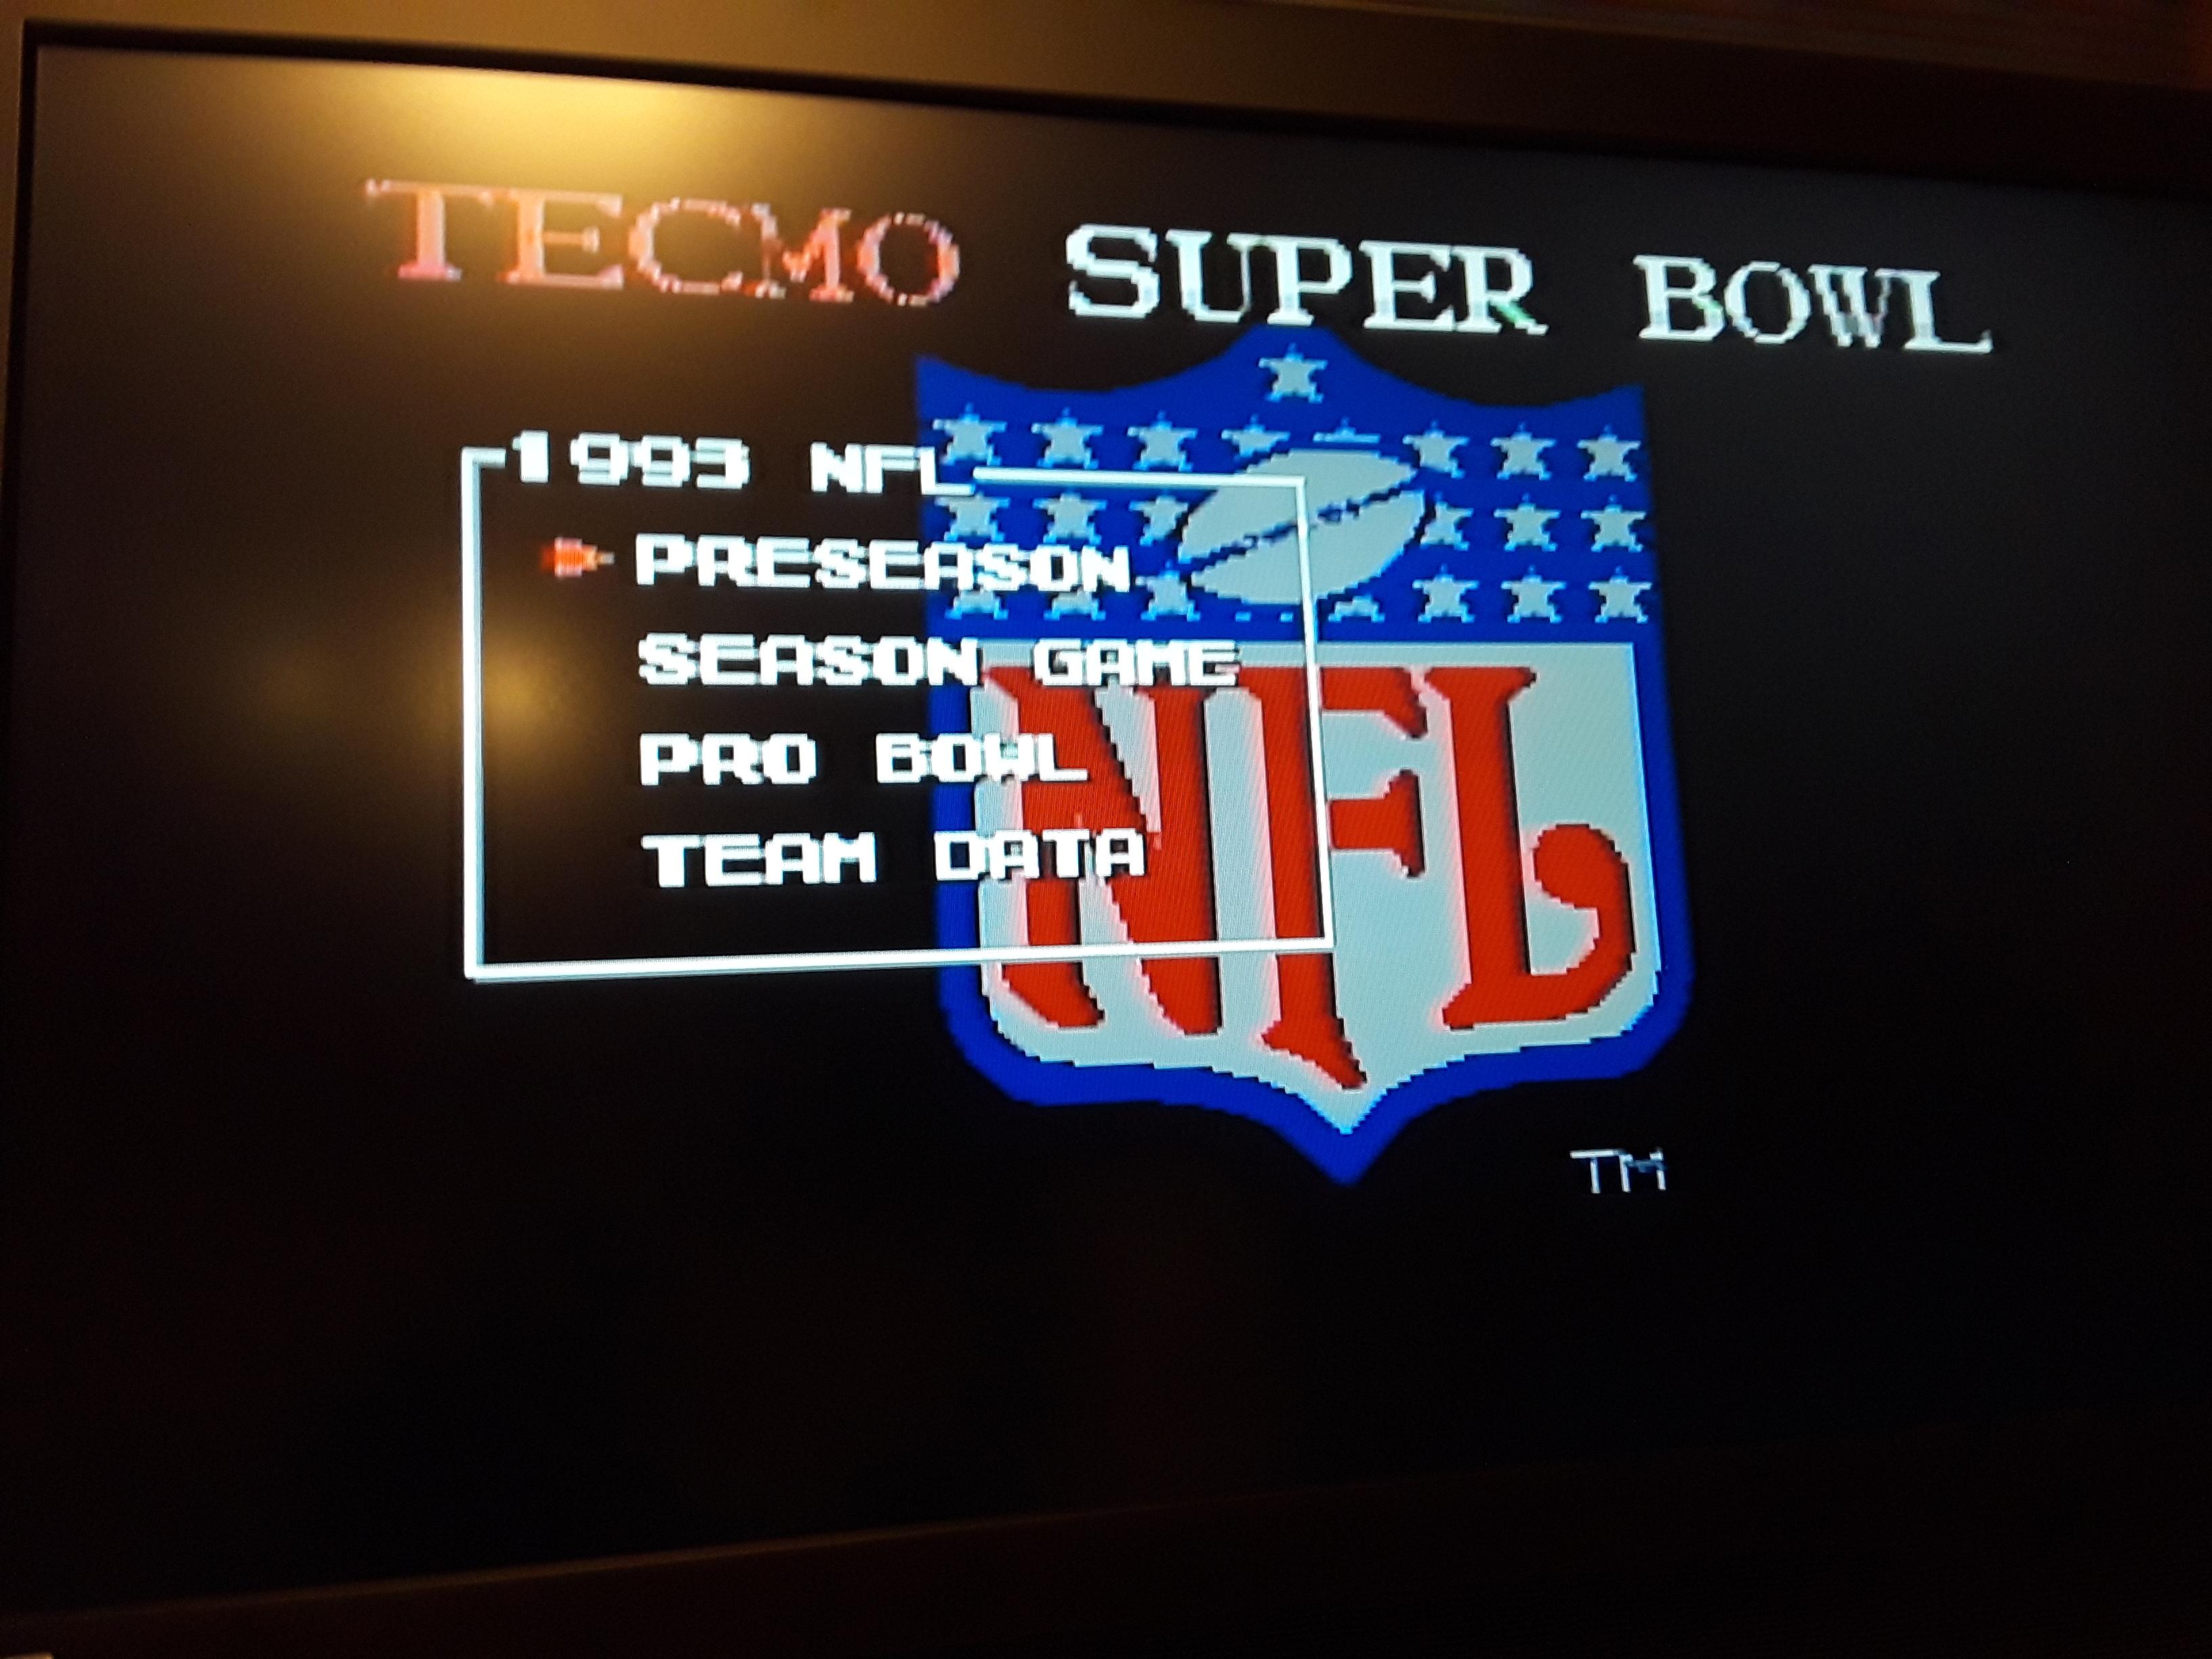 Tecmo Super Bowl [Most 1st Downs] [Preseason Game] 10 points